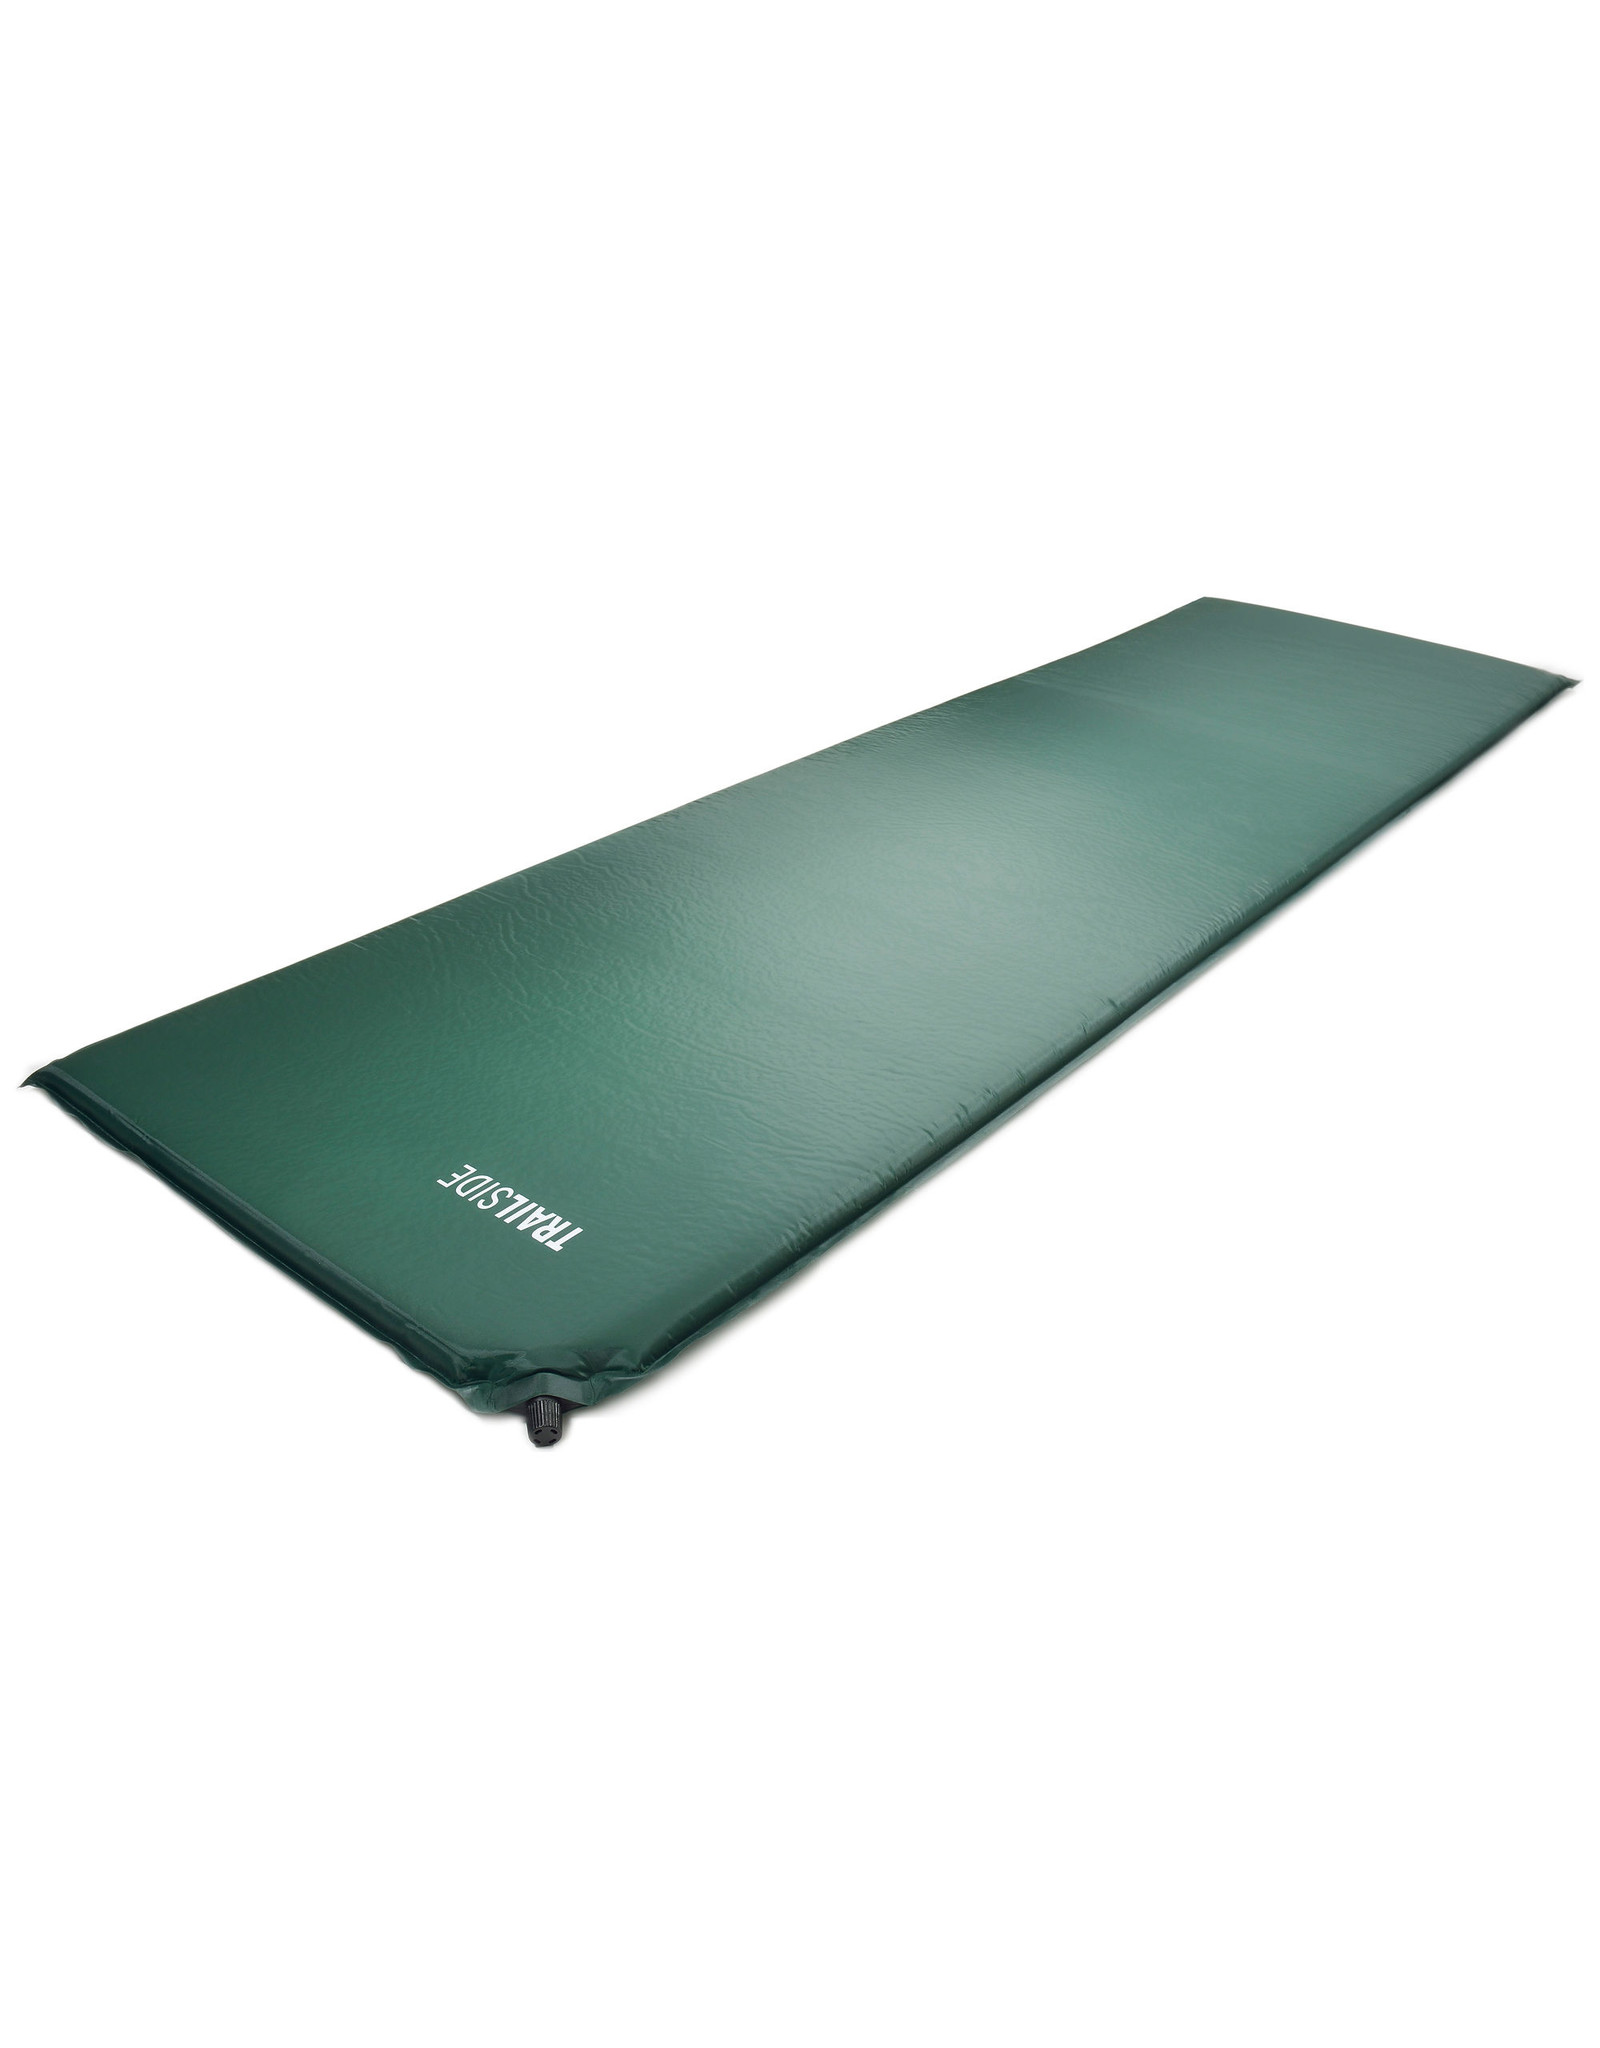 TRAILSIDE trailside trailrest mattress large - 29116